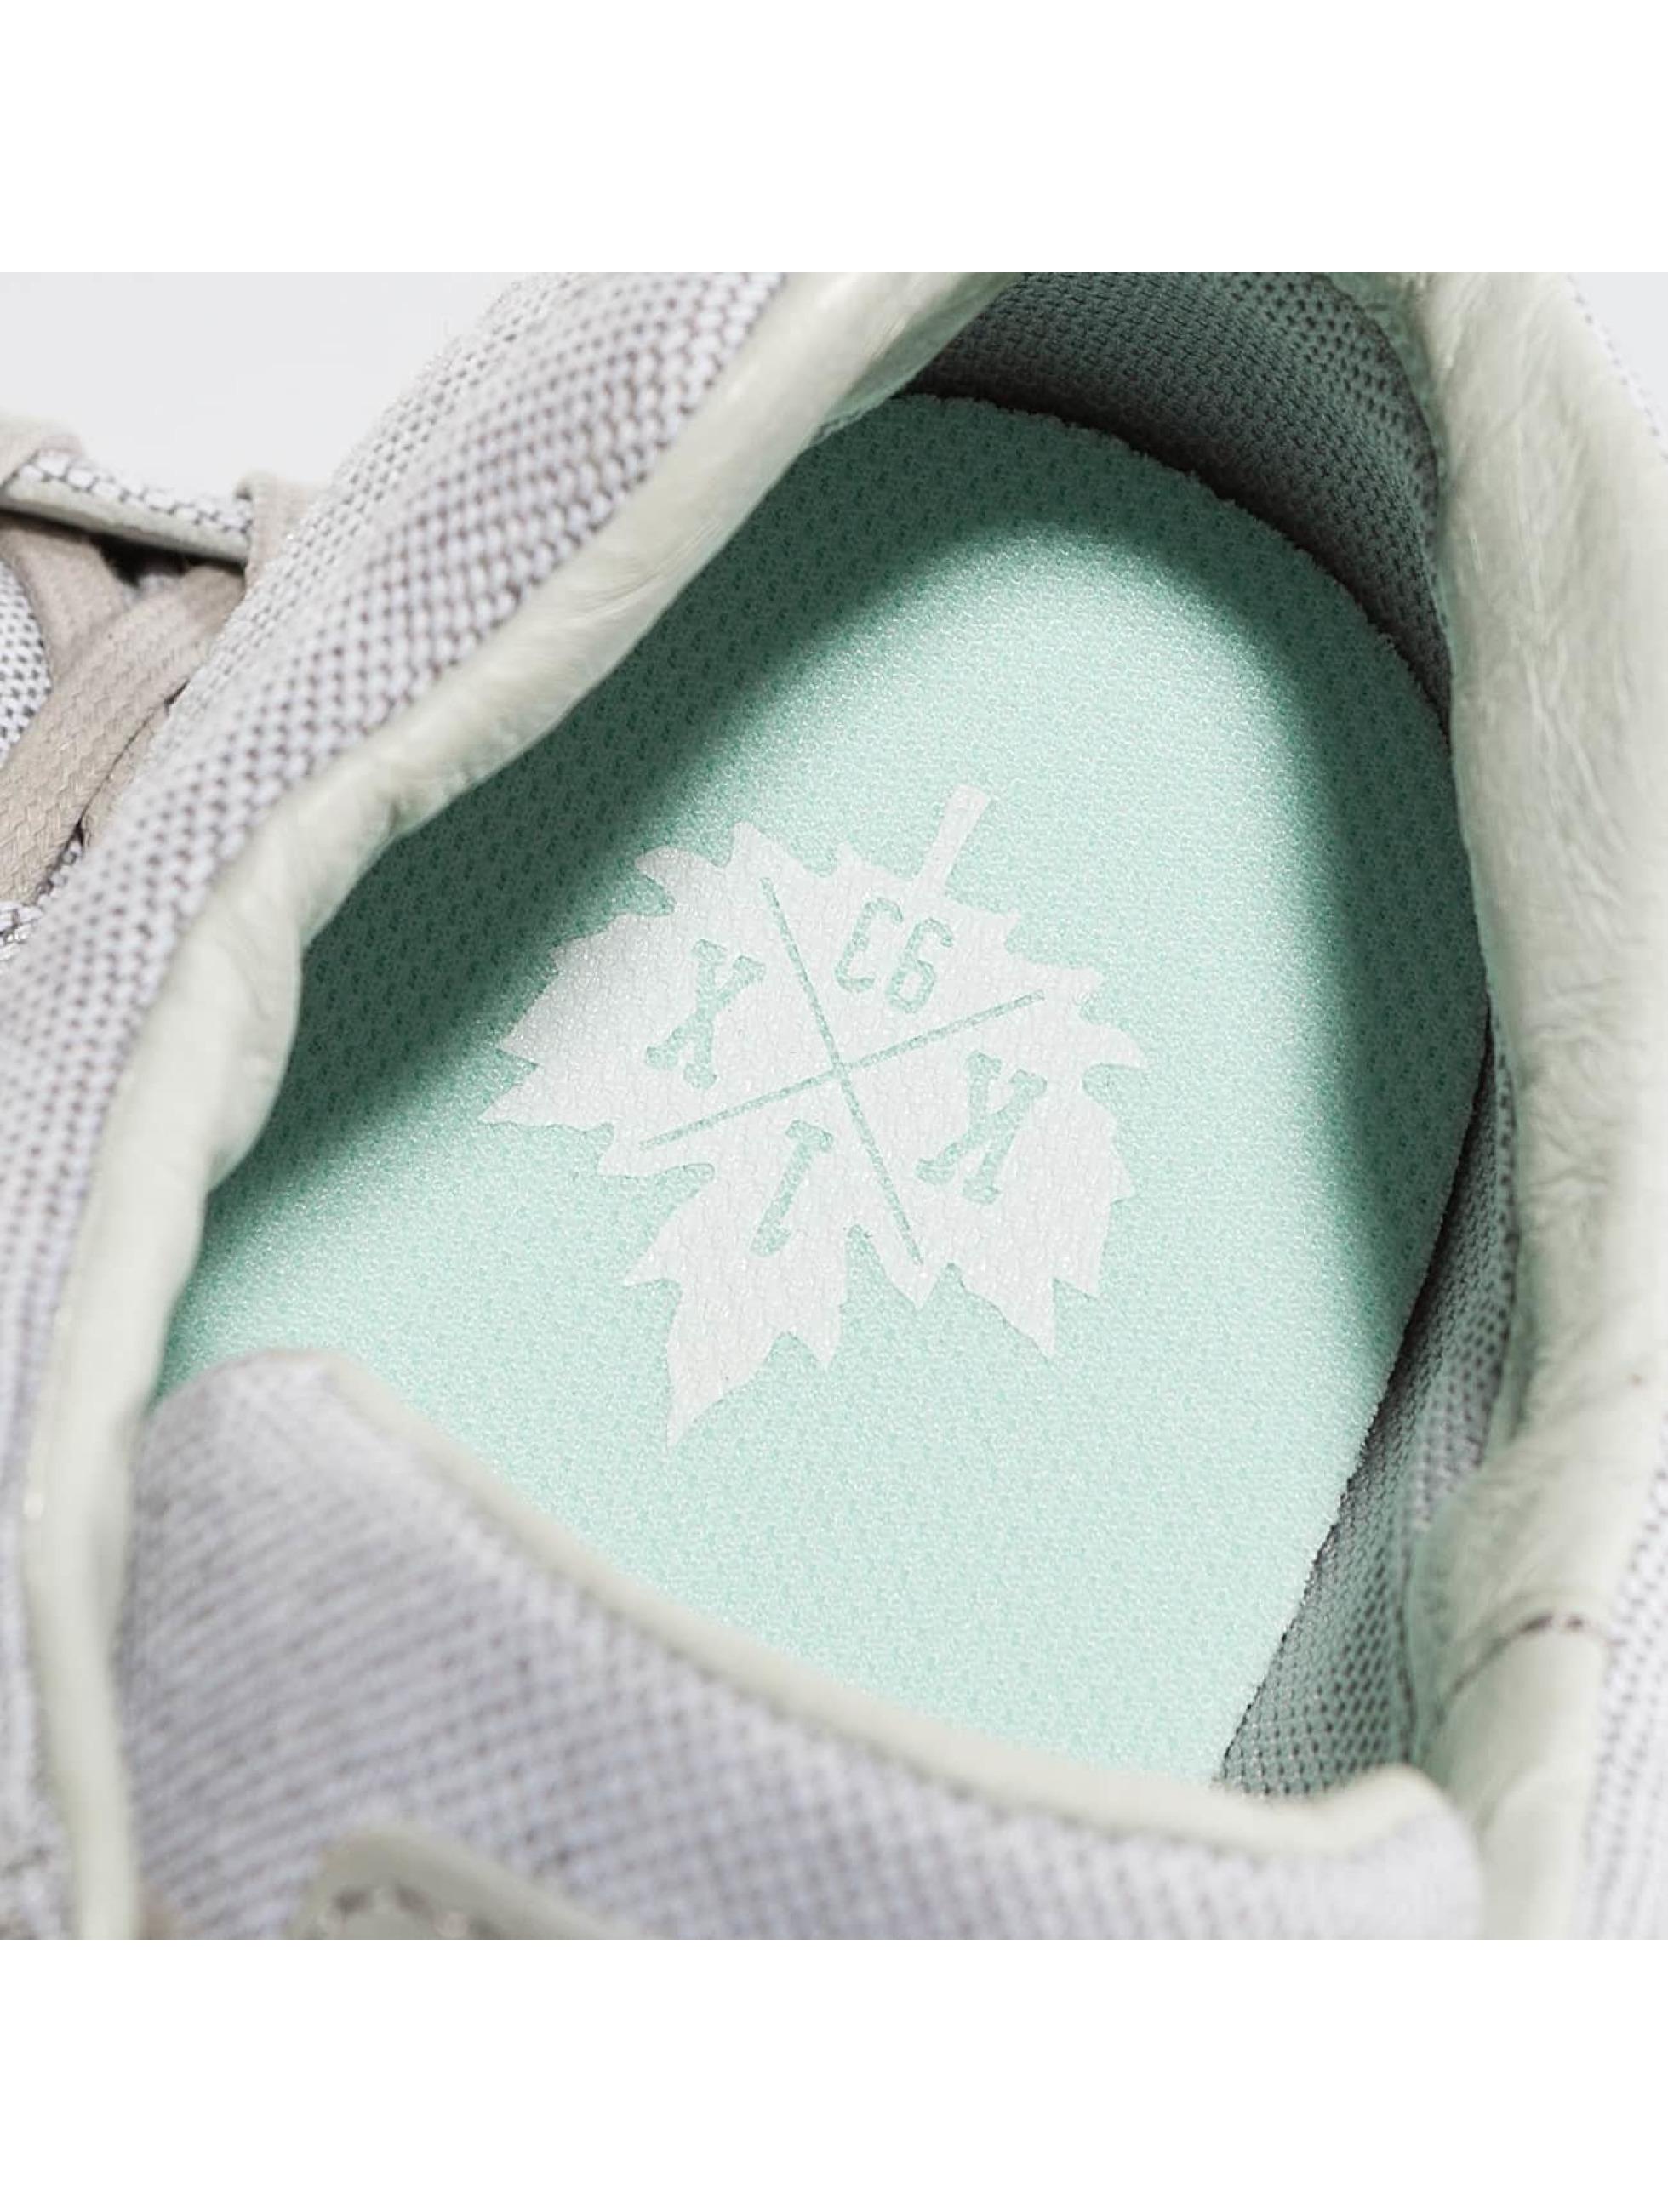 K1X Sneakers Dress Up Light Weight gray